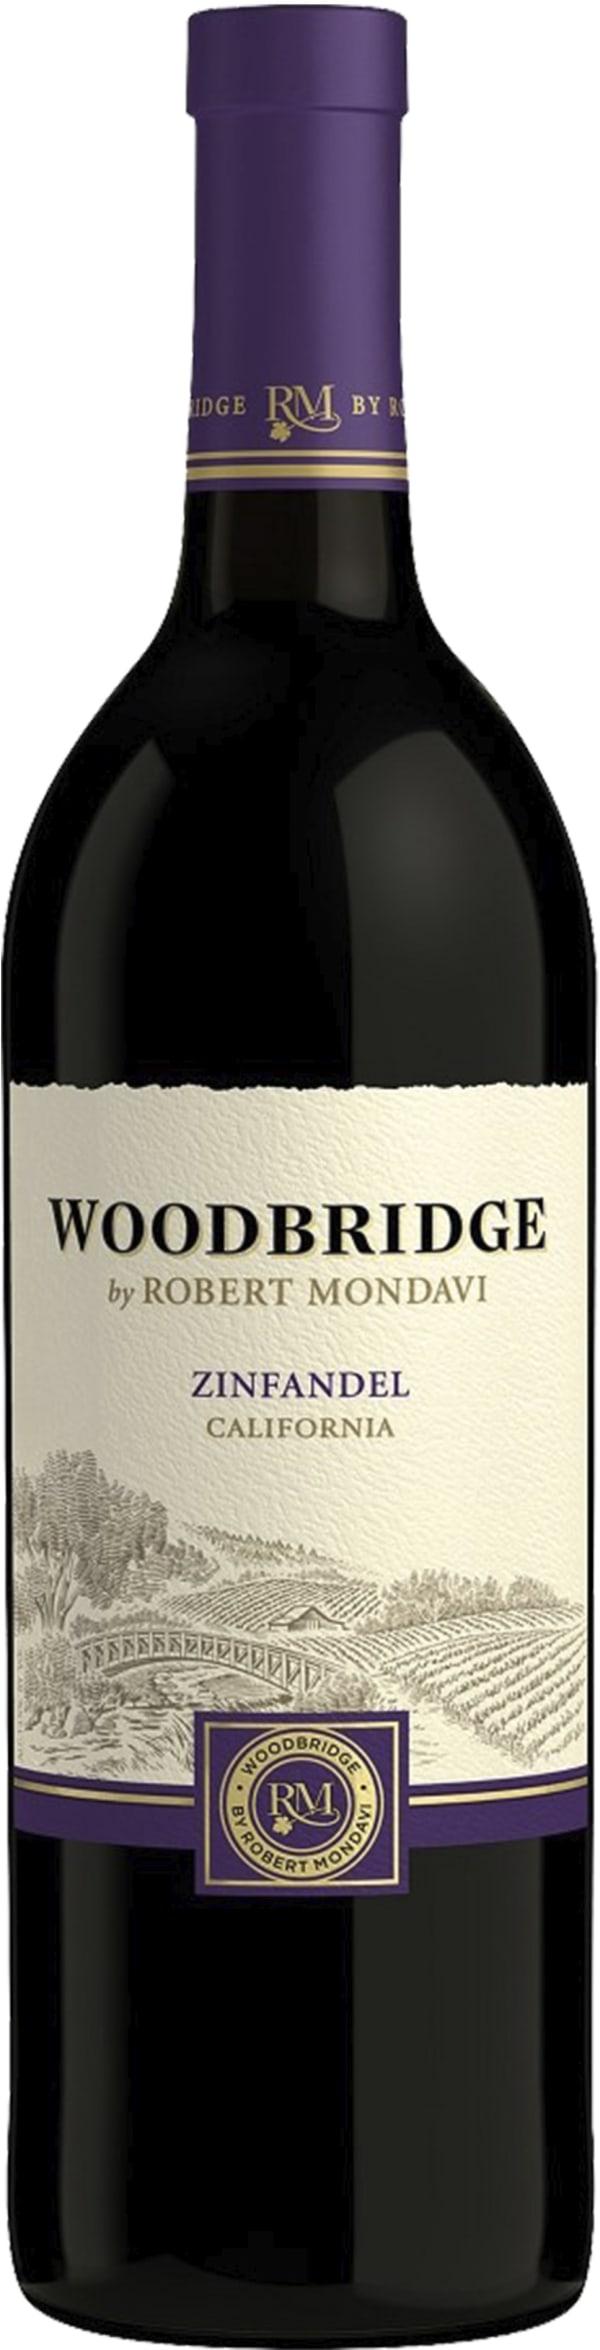 Robert Mondavi Woodbridge Zinfandel 2014